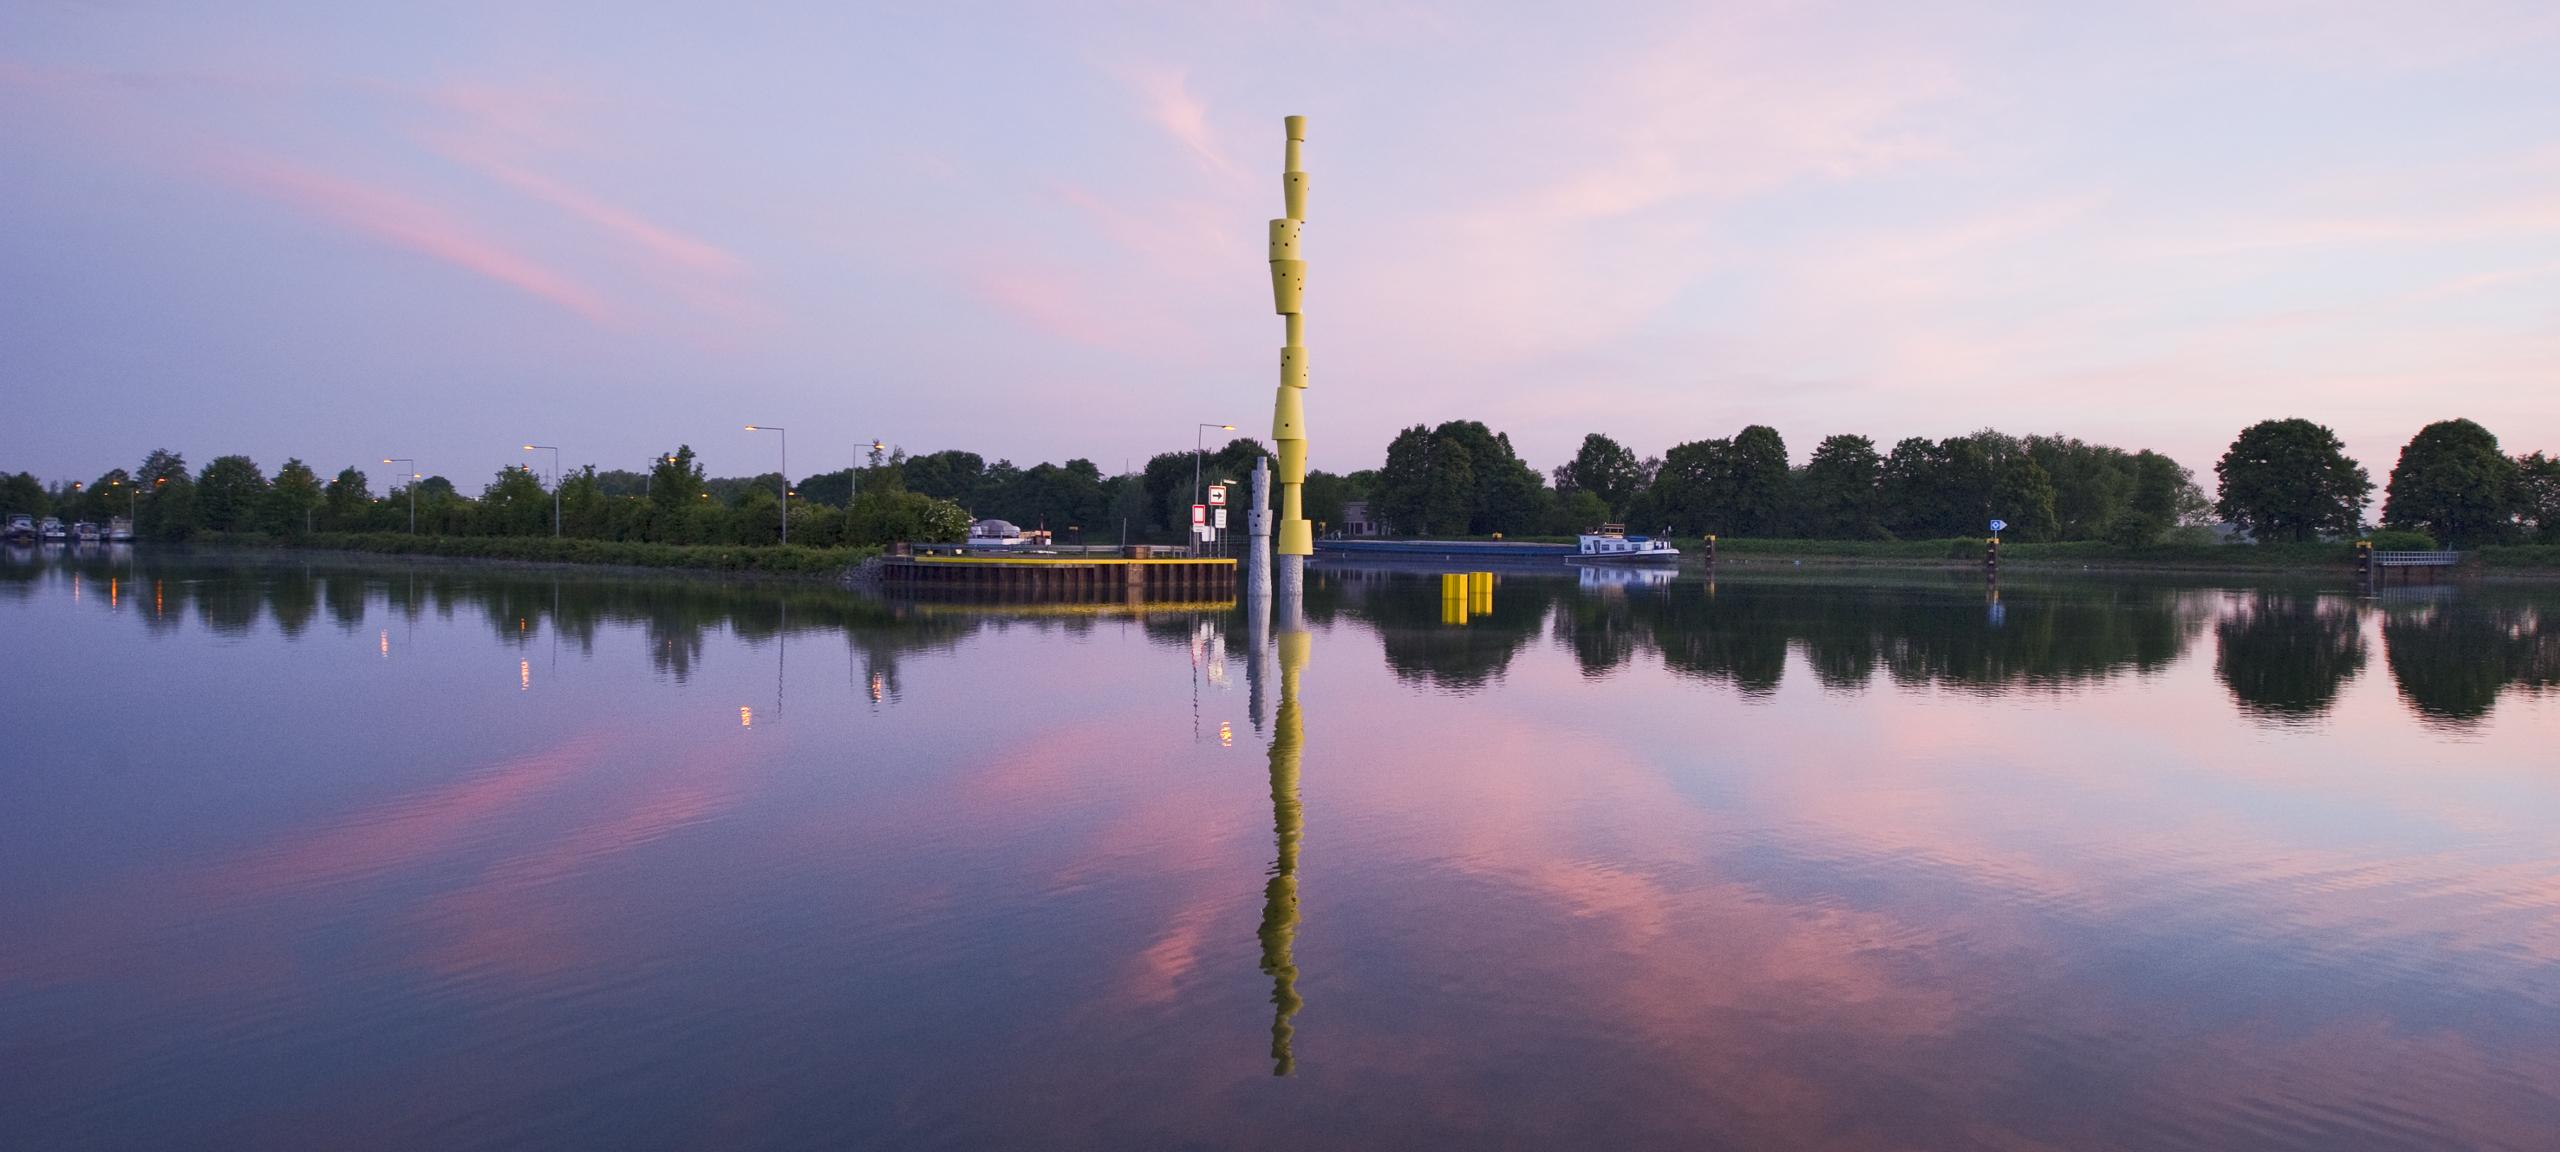 "Die Landmarke ""Reemrenreh"" von Bogomir Ecker in Herne"